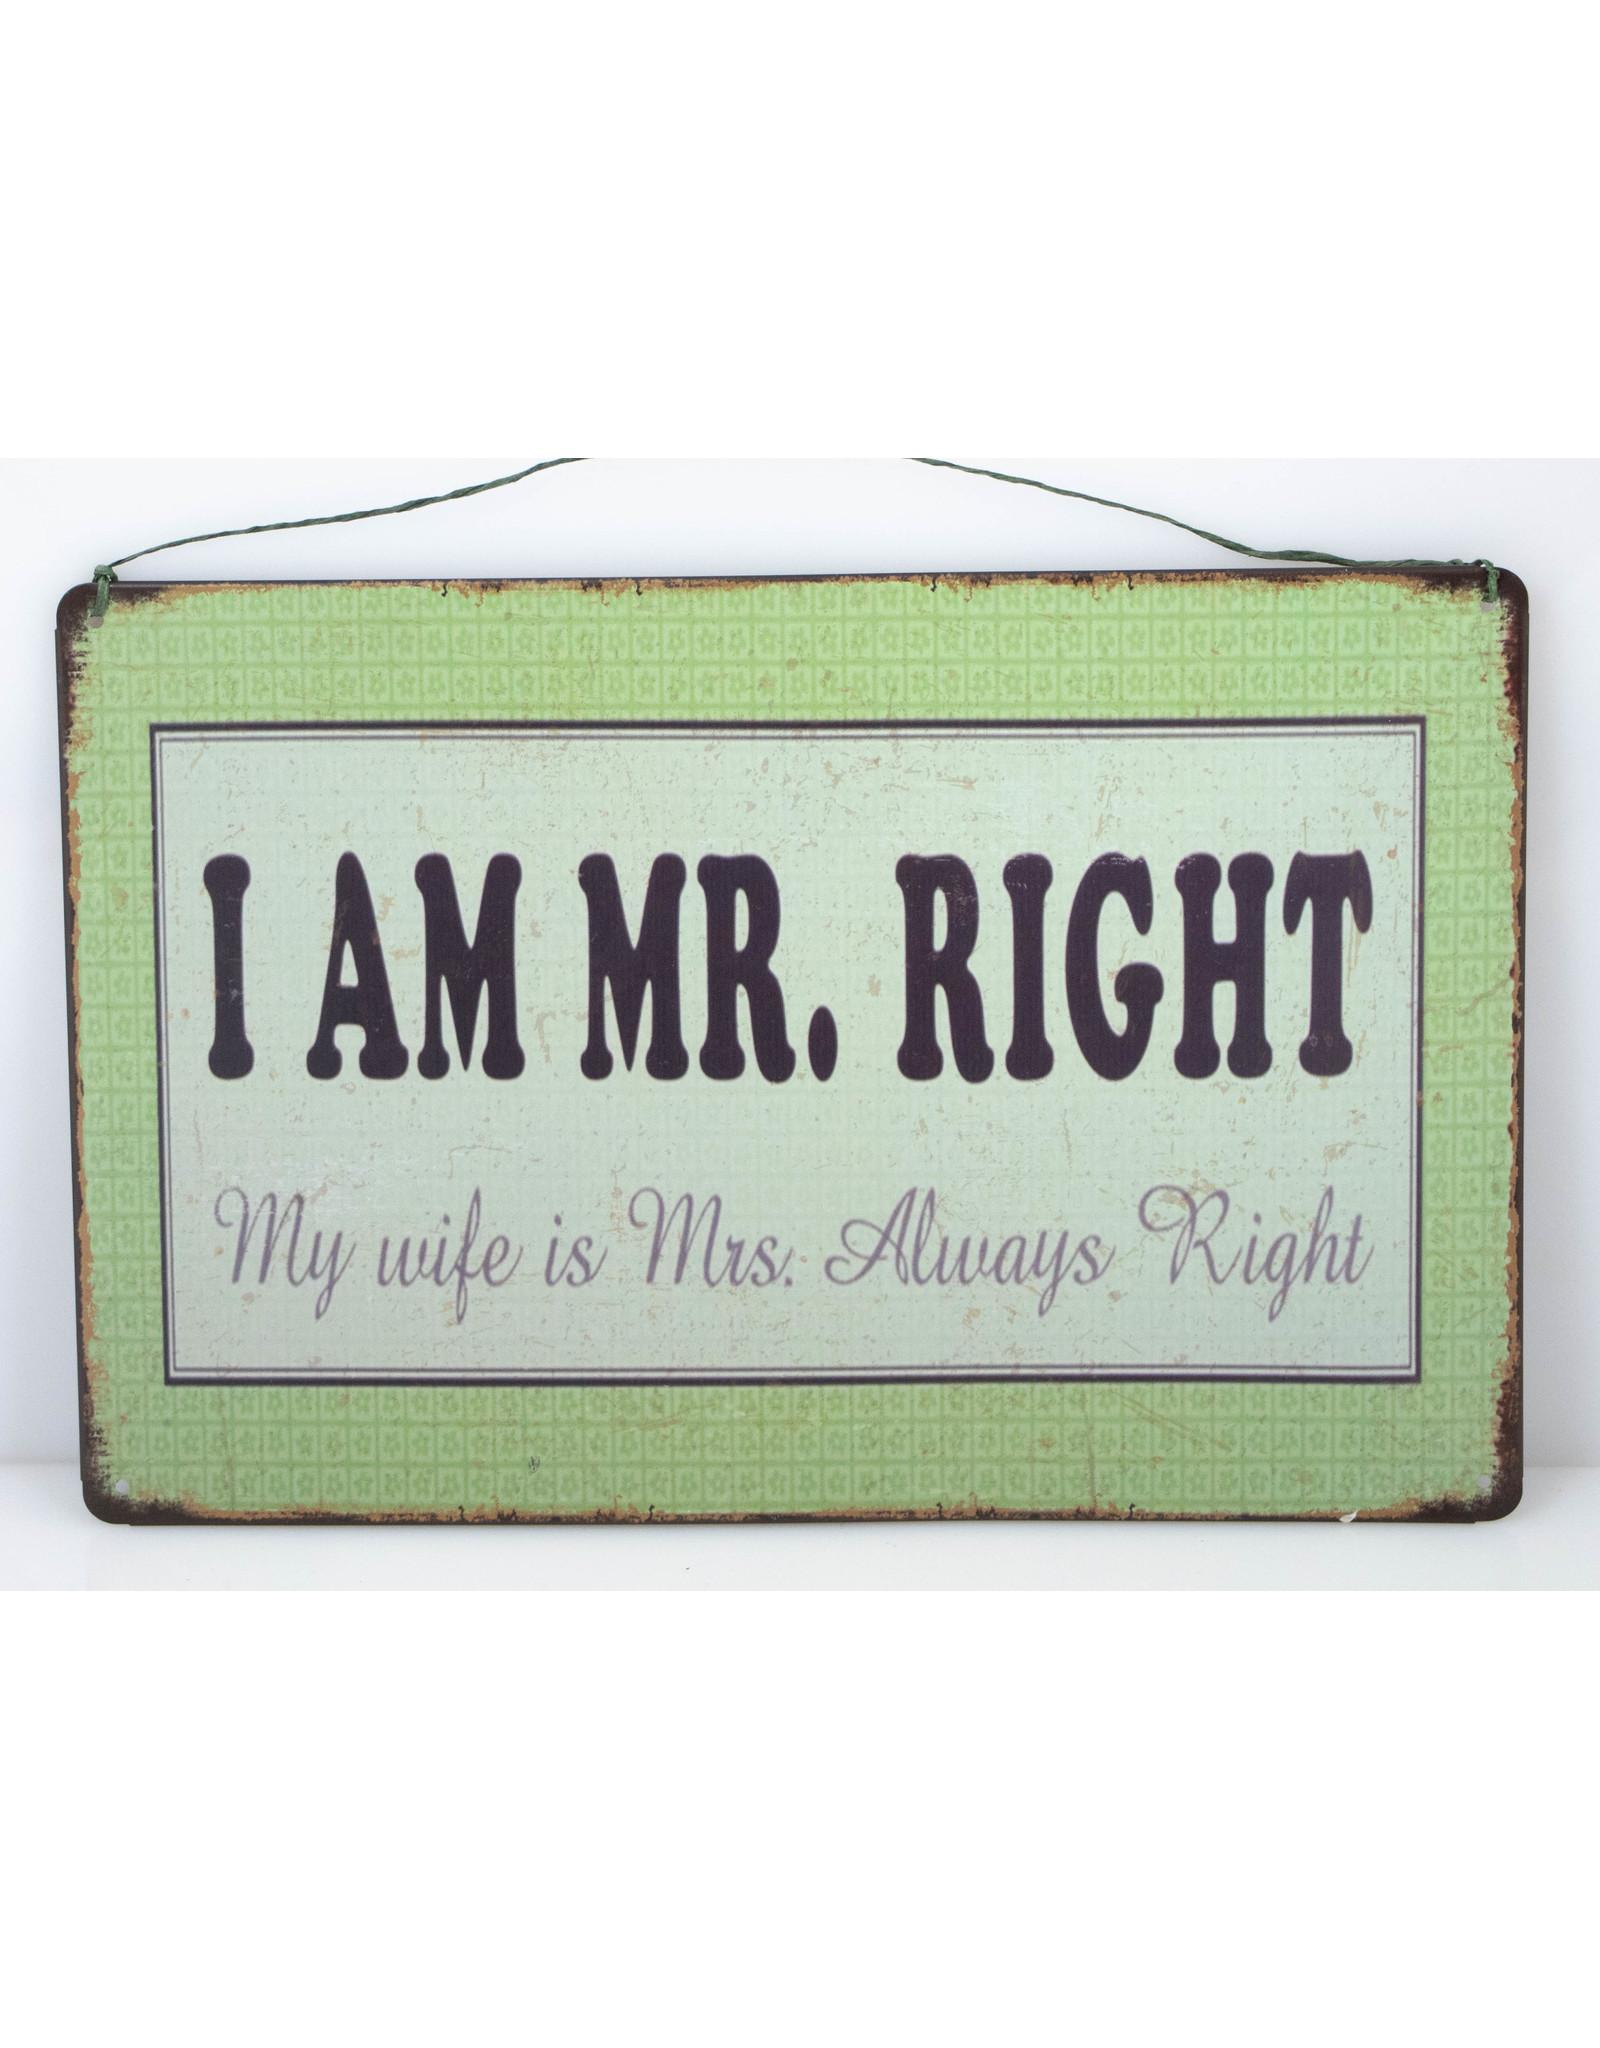 I am Mr. right